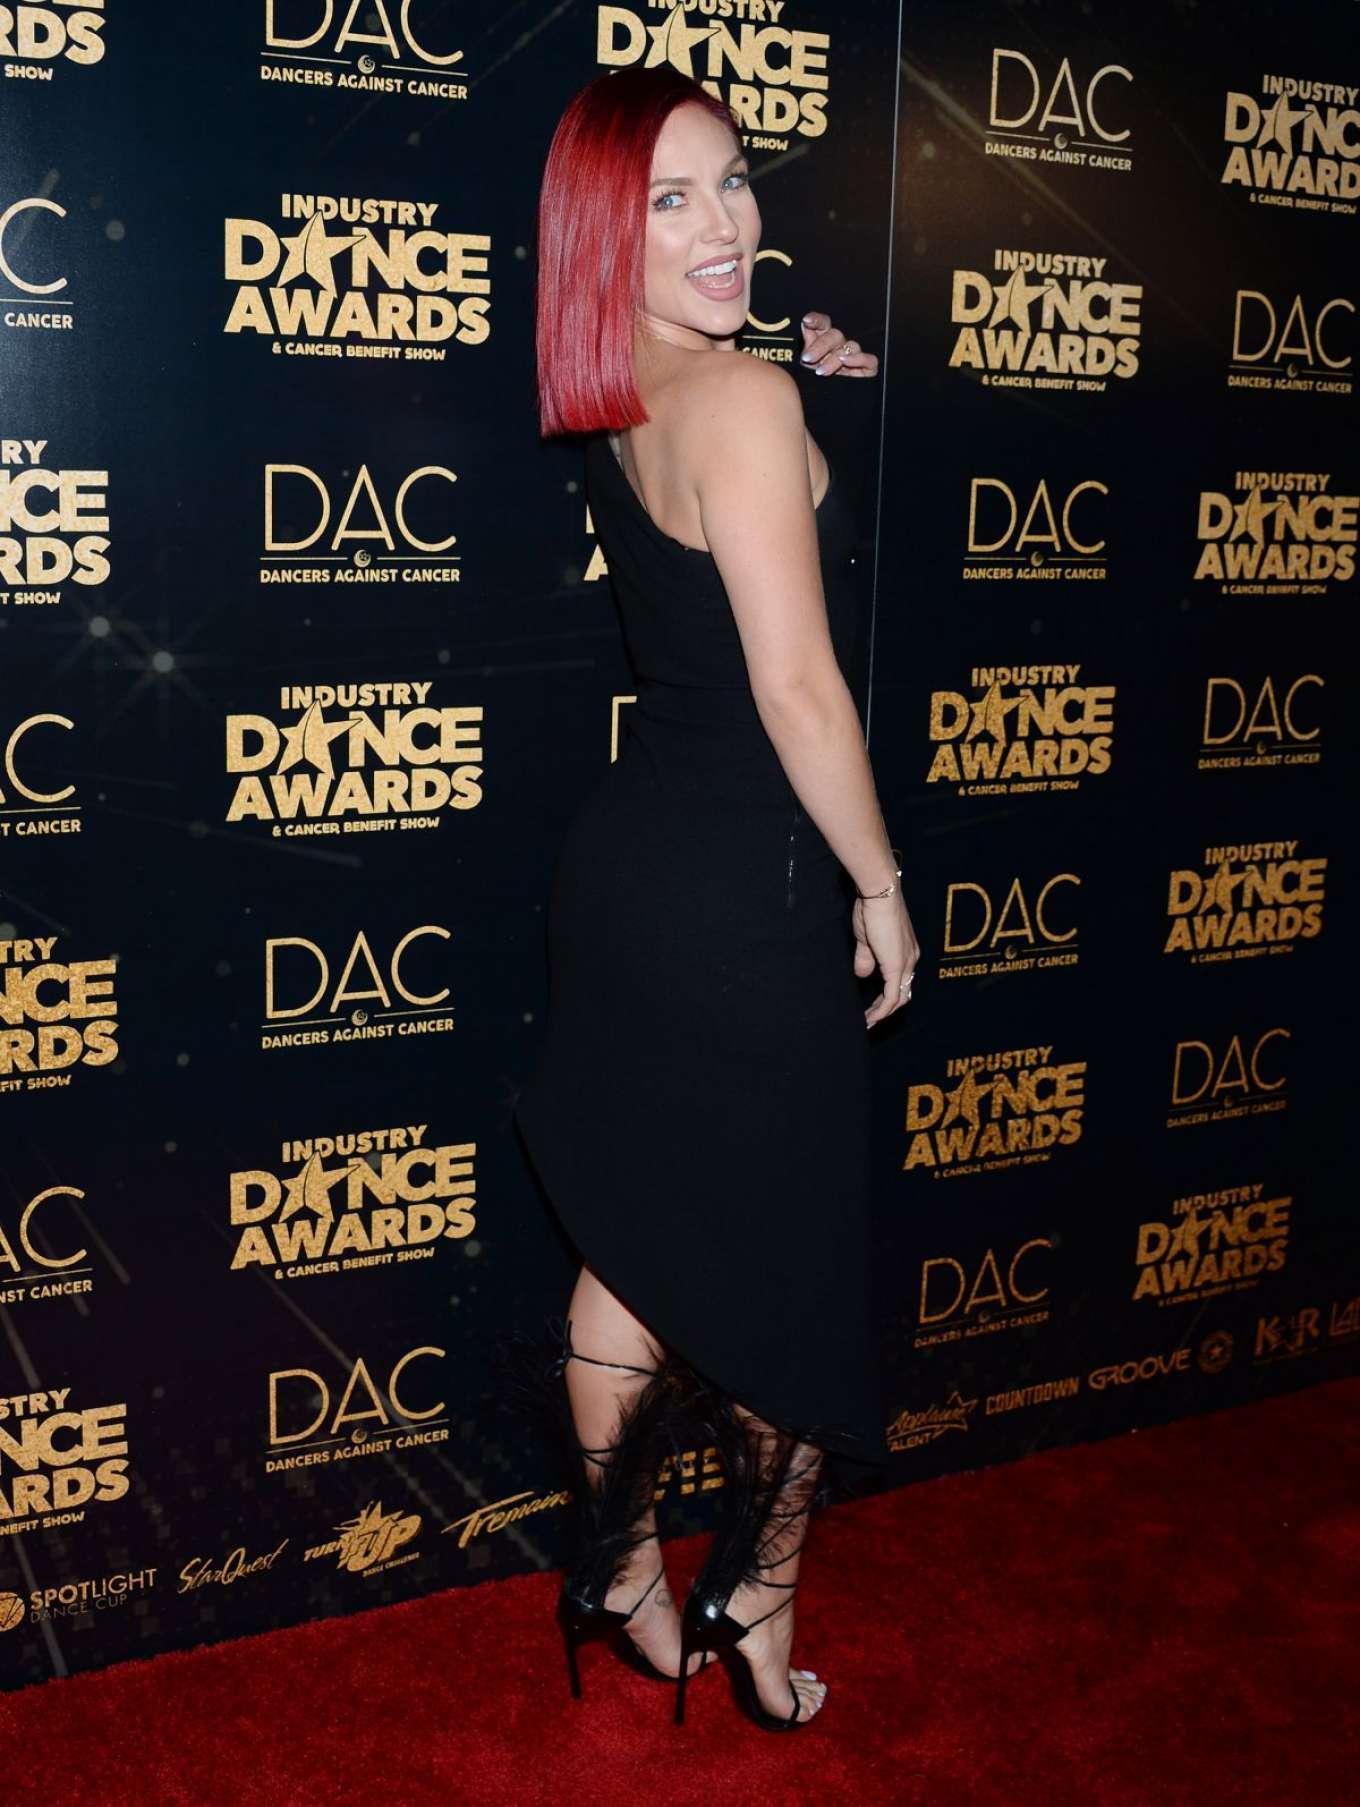 Sharna Burgess 2018 : Sharna Burgess: 2018 Industry Dance Awards -02